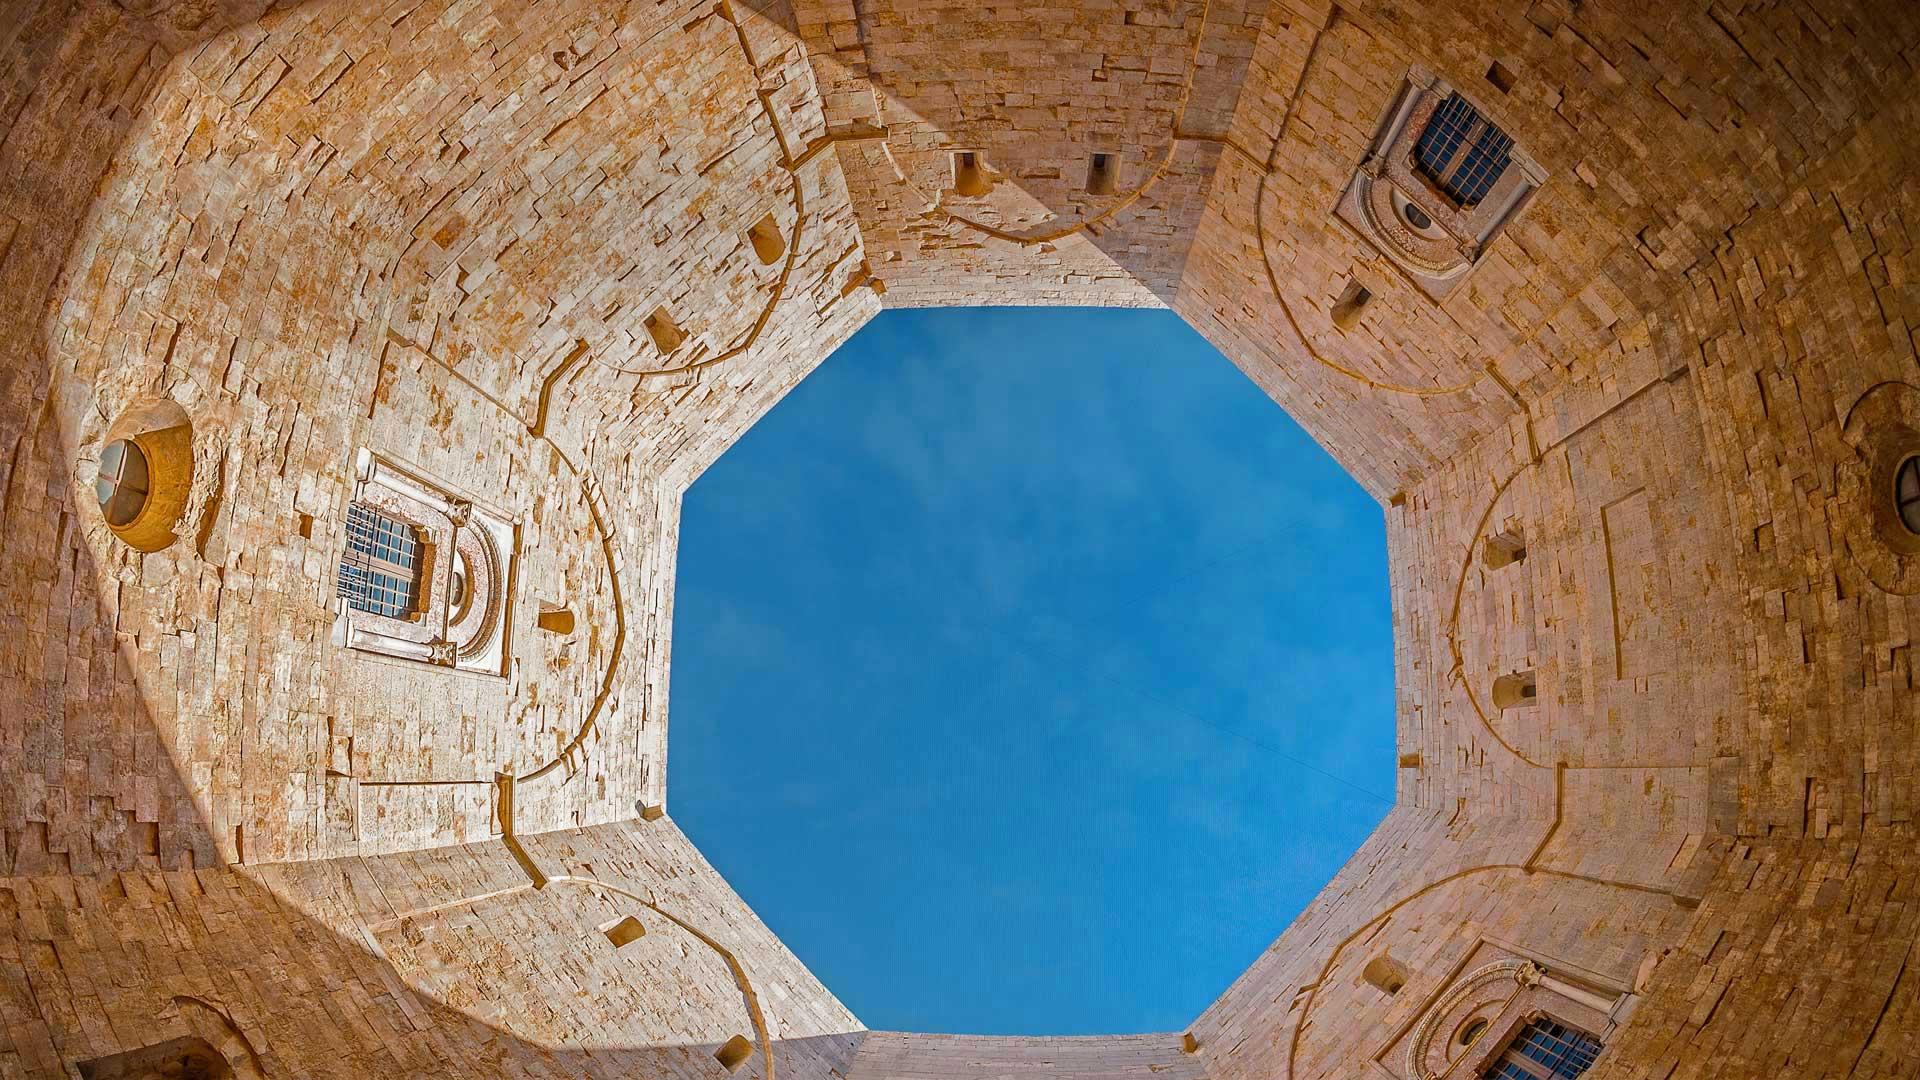 Castel del Monte, Apulia, Italy (? Toni Spagone/Alamy)